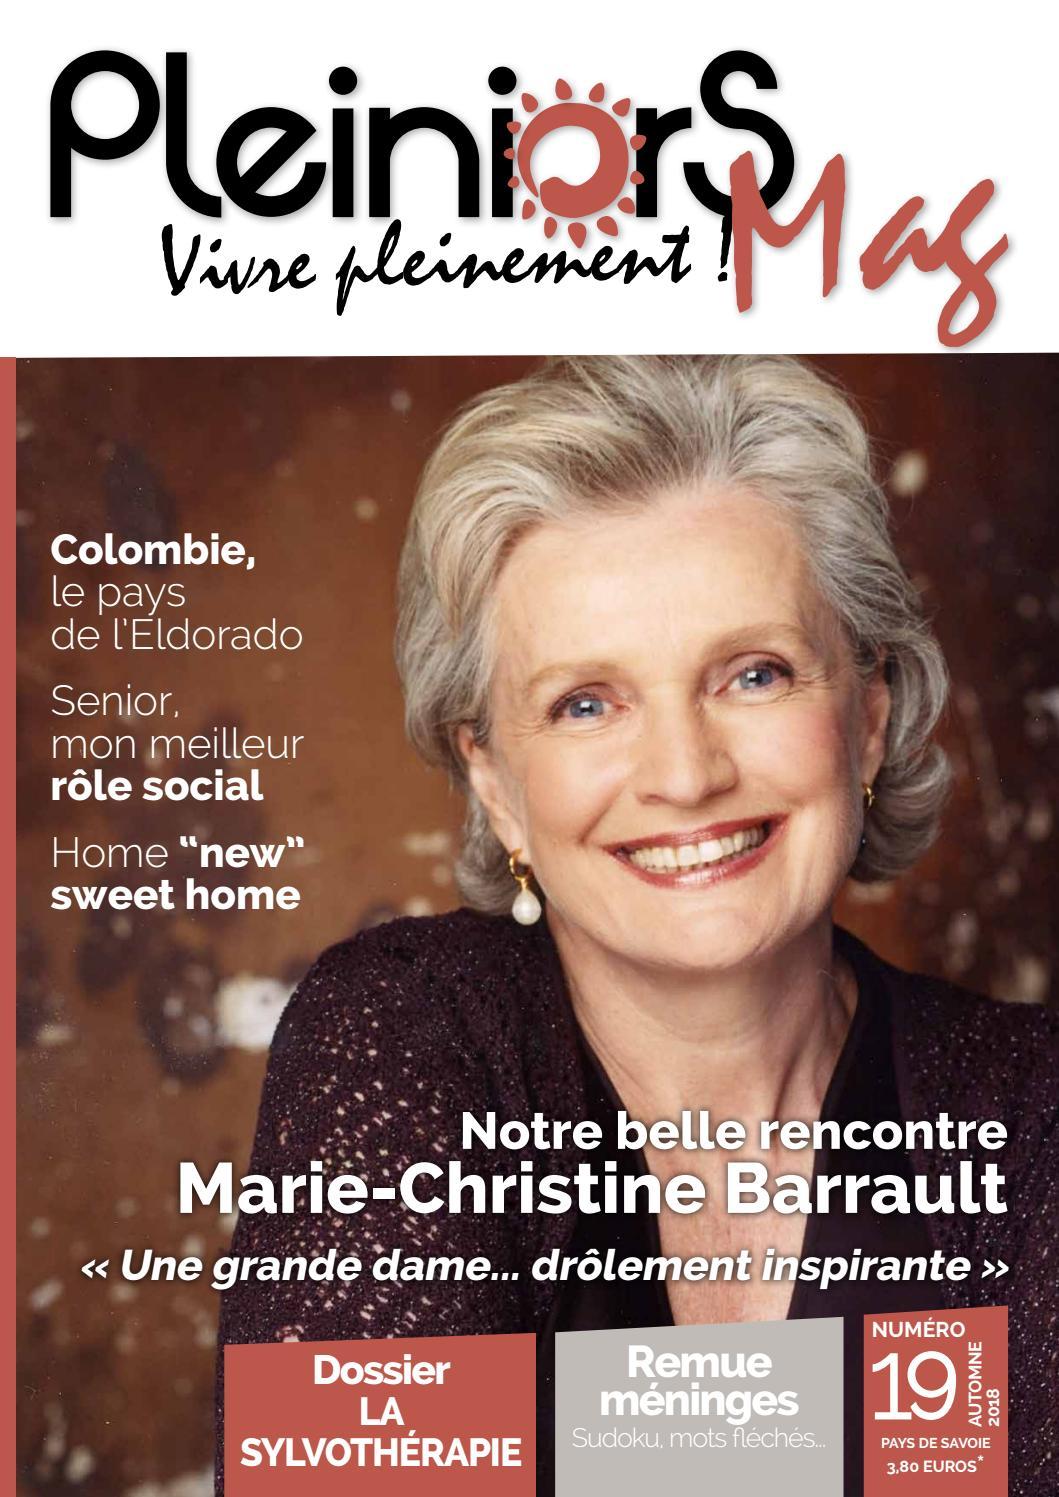 f74b000db862 Pleiniors Mag n°19 Vivre pleinement ! by Hélène Breden - issuu